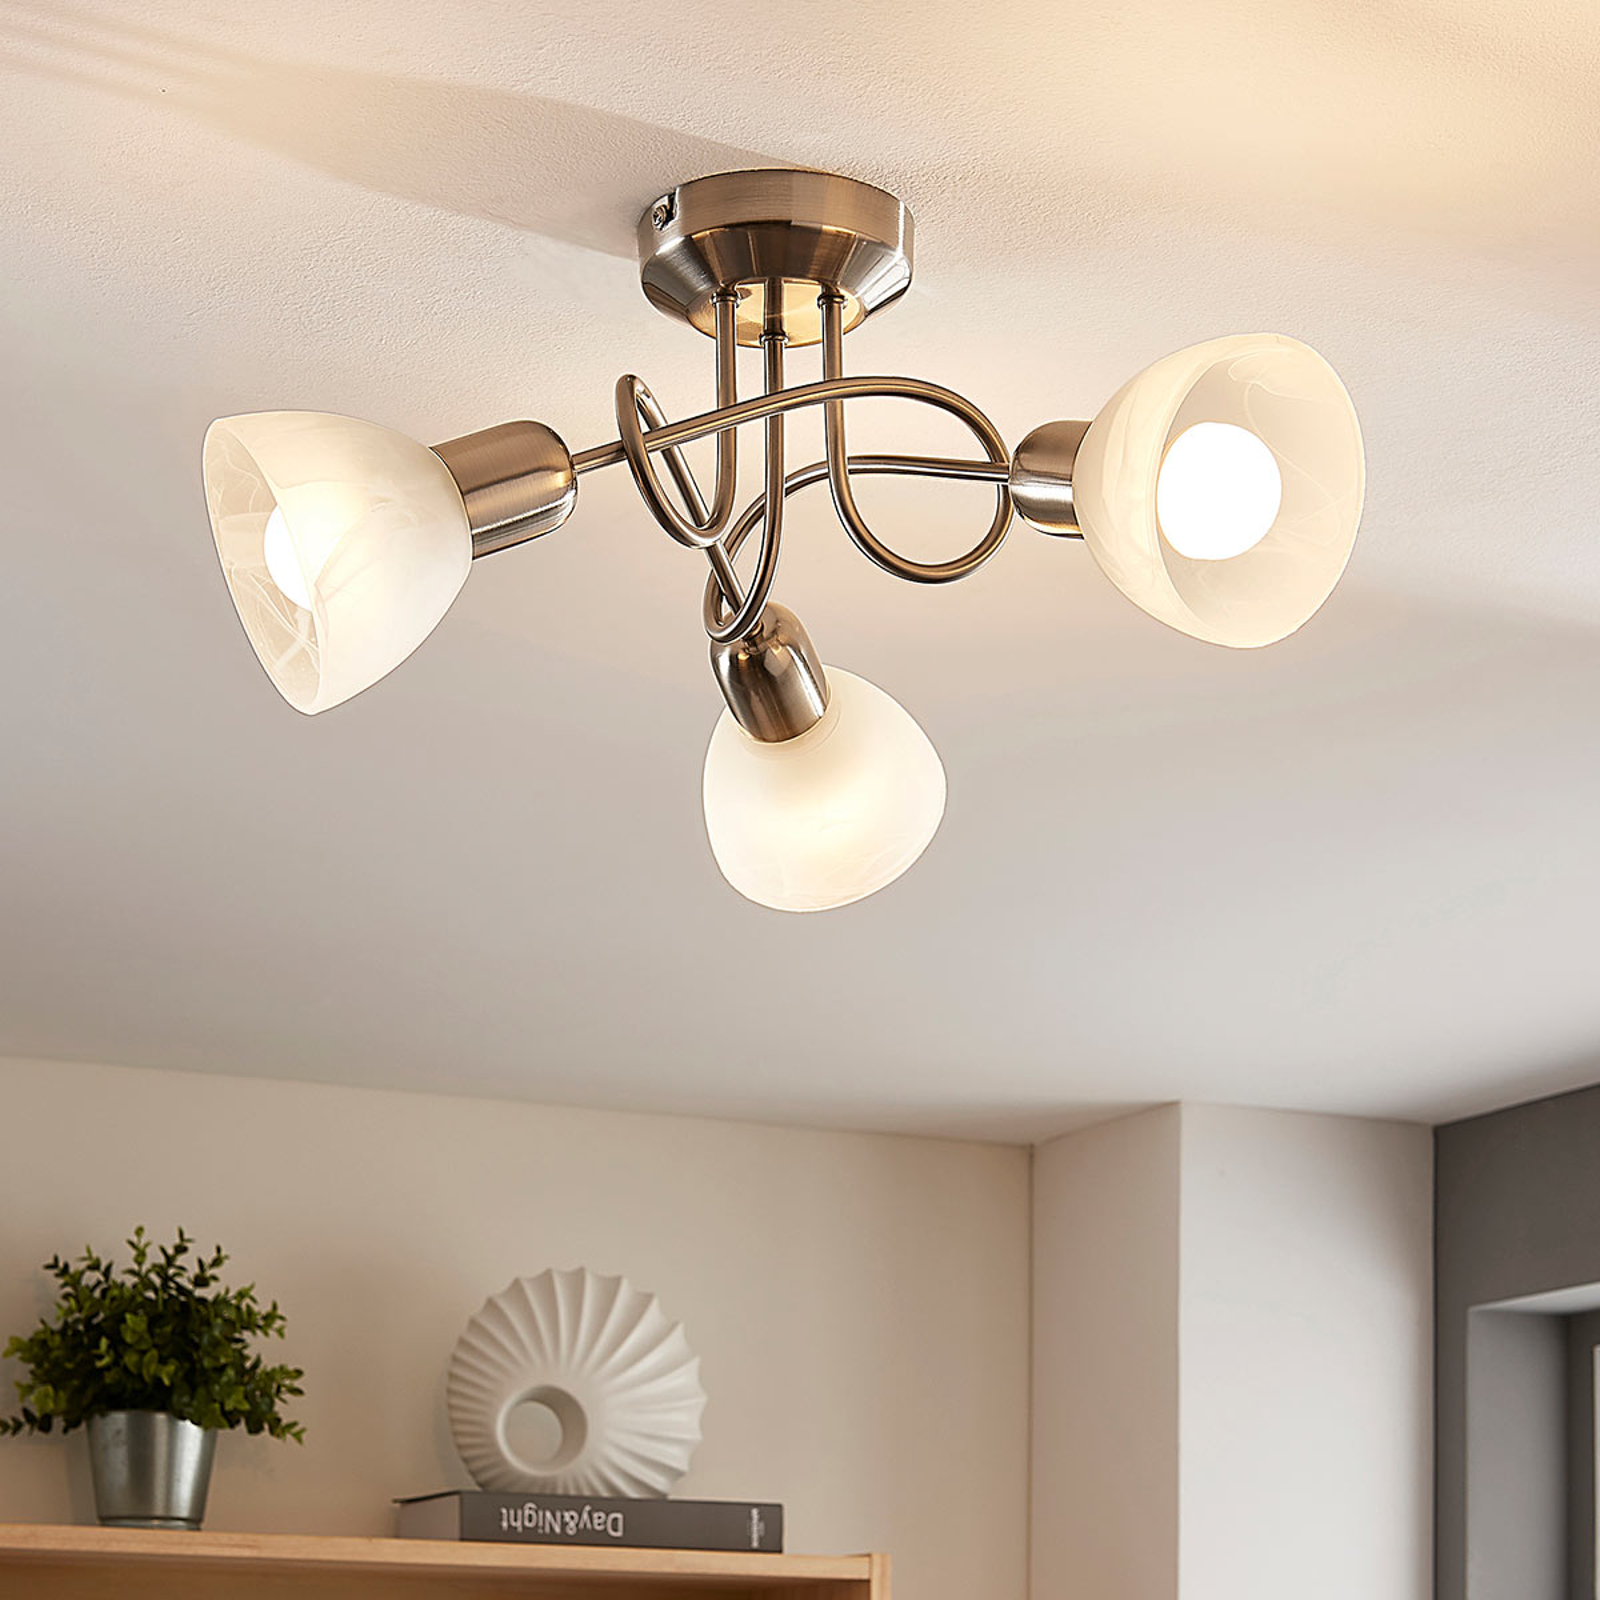 Lindby Paulina LED-taklampe, 3 lyskilder, rund